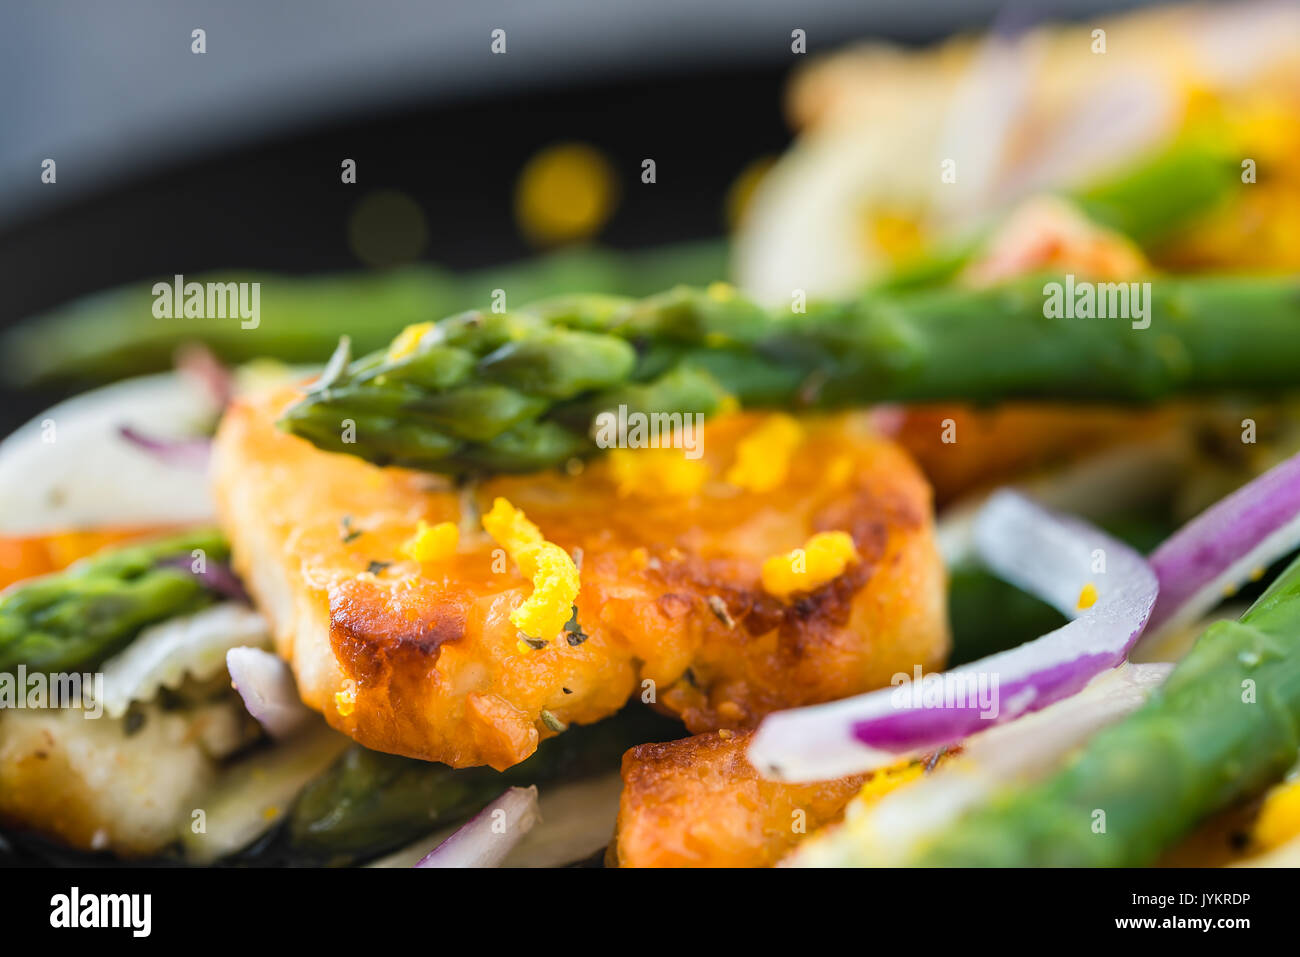 Salad with fried halloumi, asparagus and orange zest. Close up. Dark concrete background Stock Photo